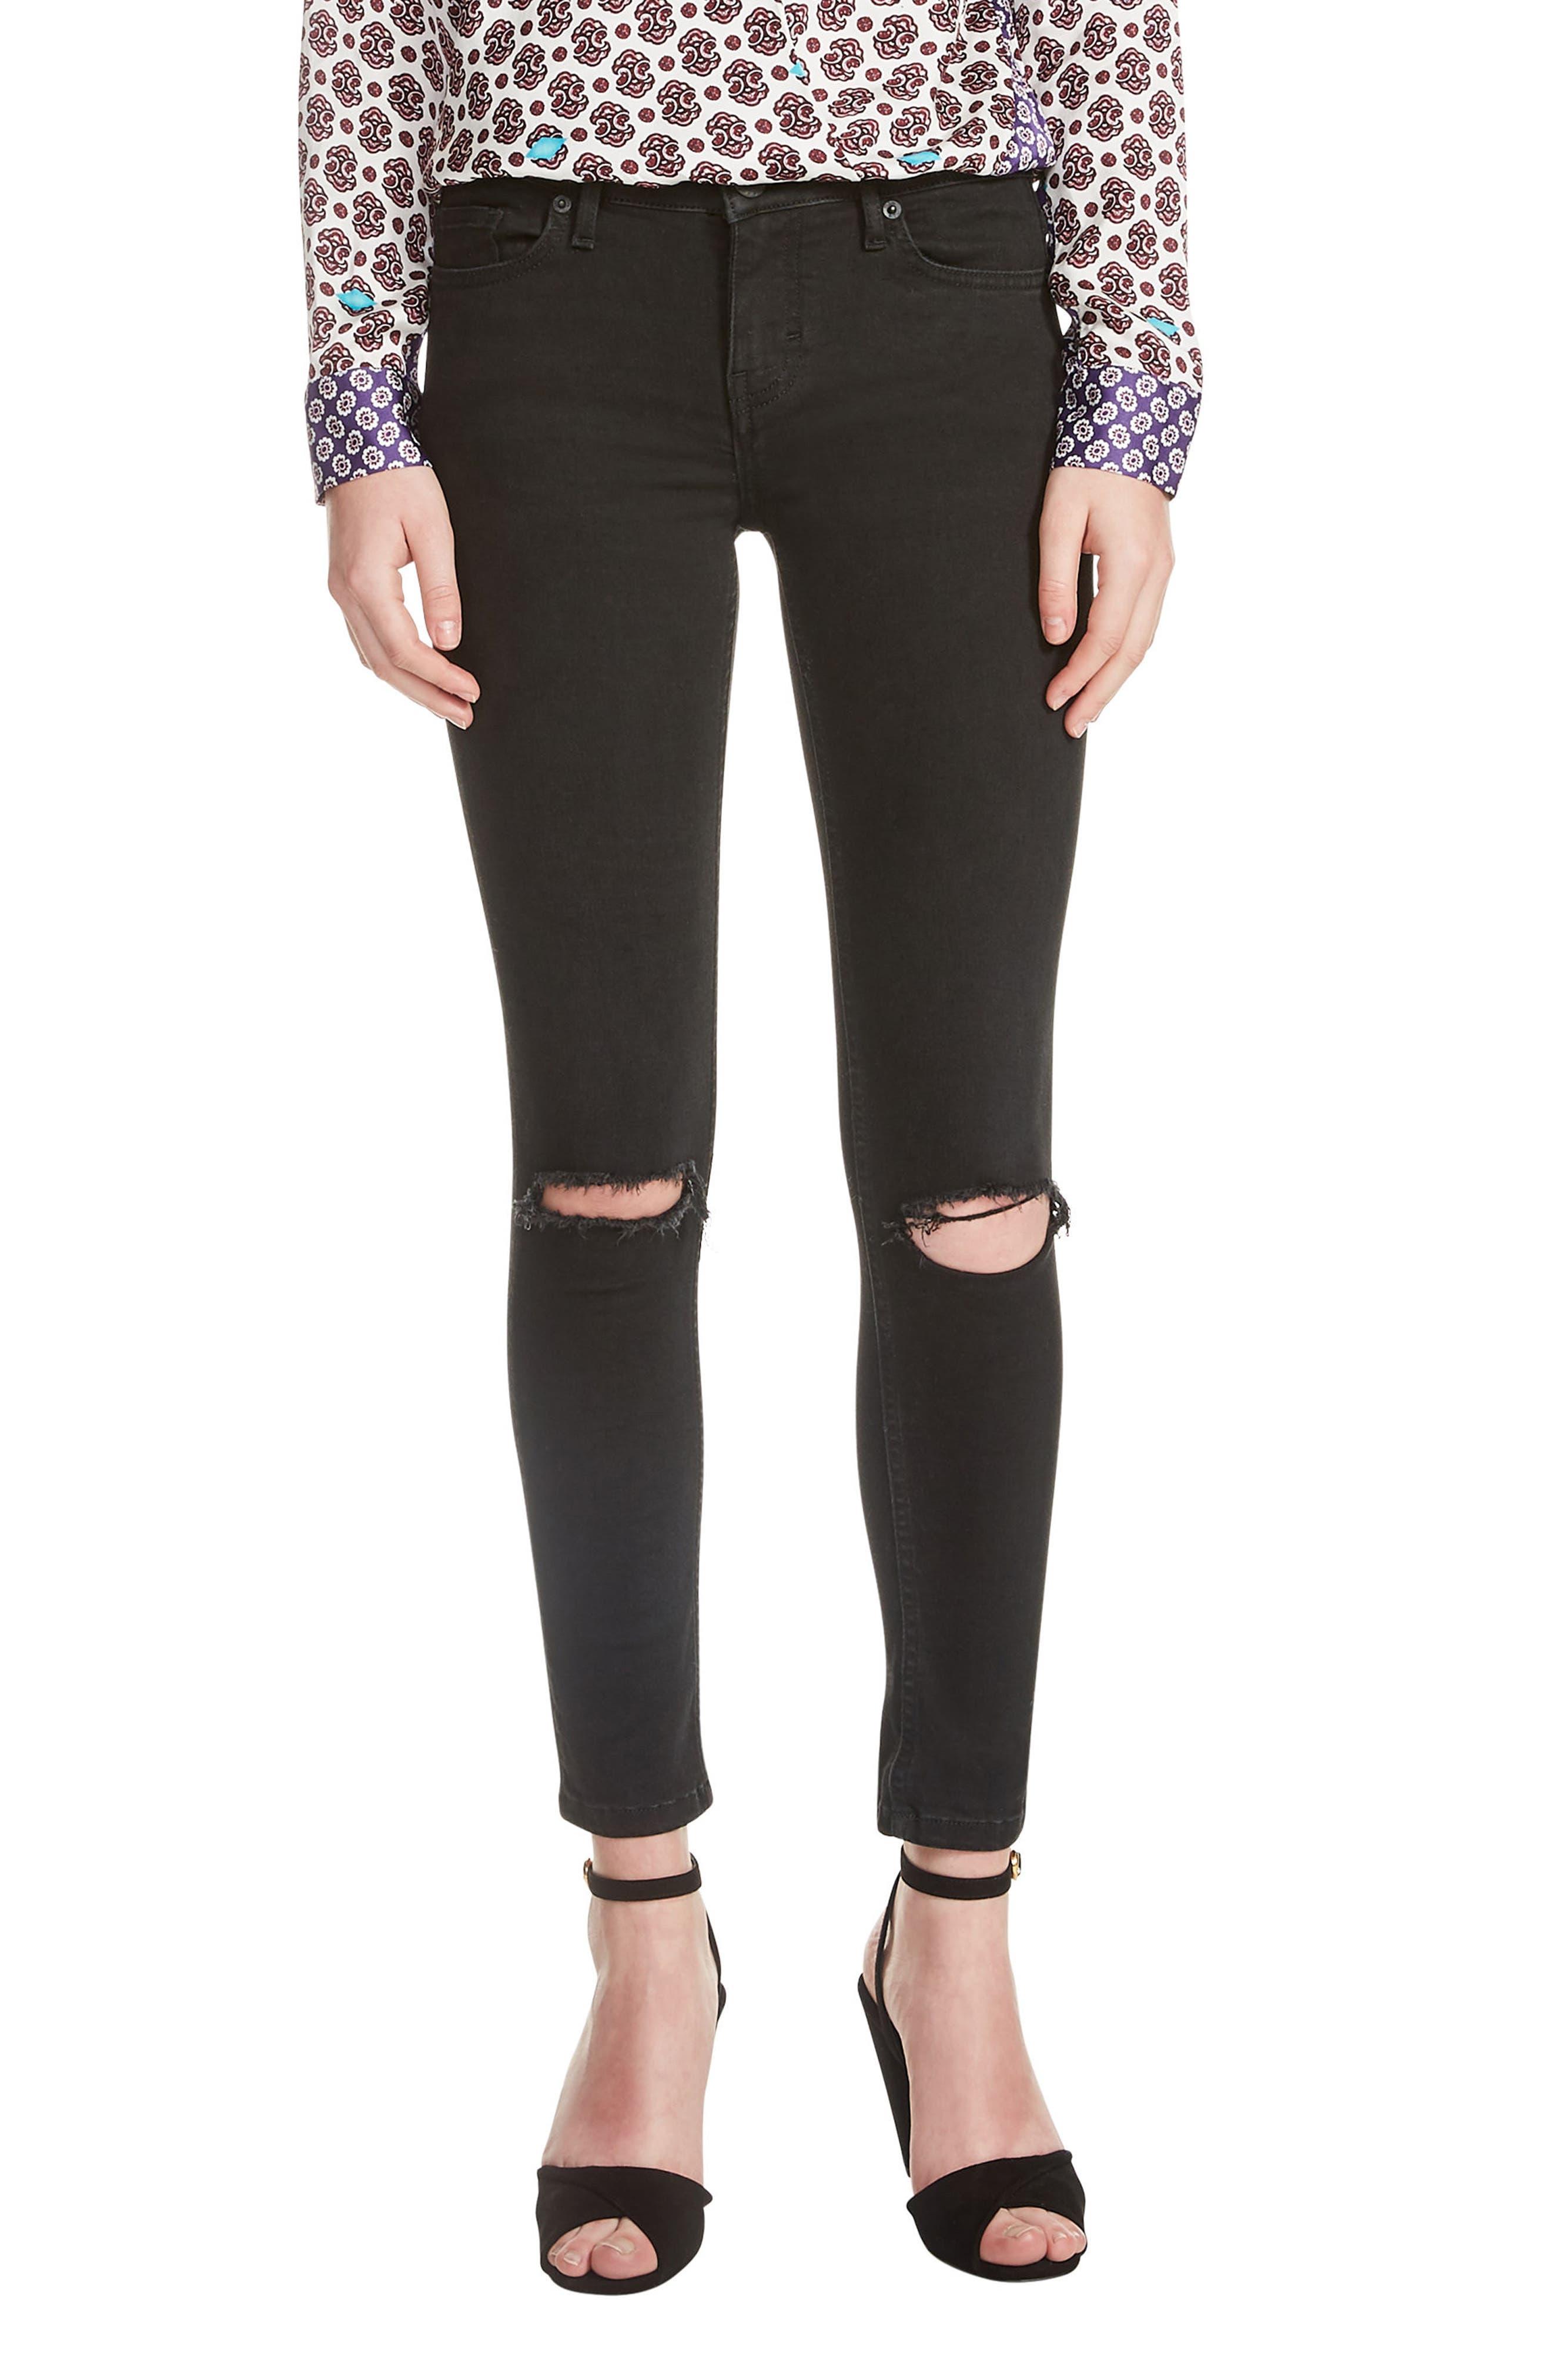 Priska Ripped Bee Embroidery Black Skinny Jeans,                             Main thumbnail 1, color,                             Black